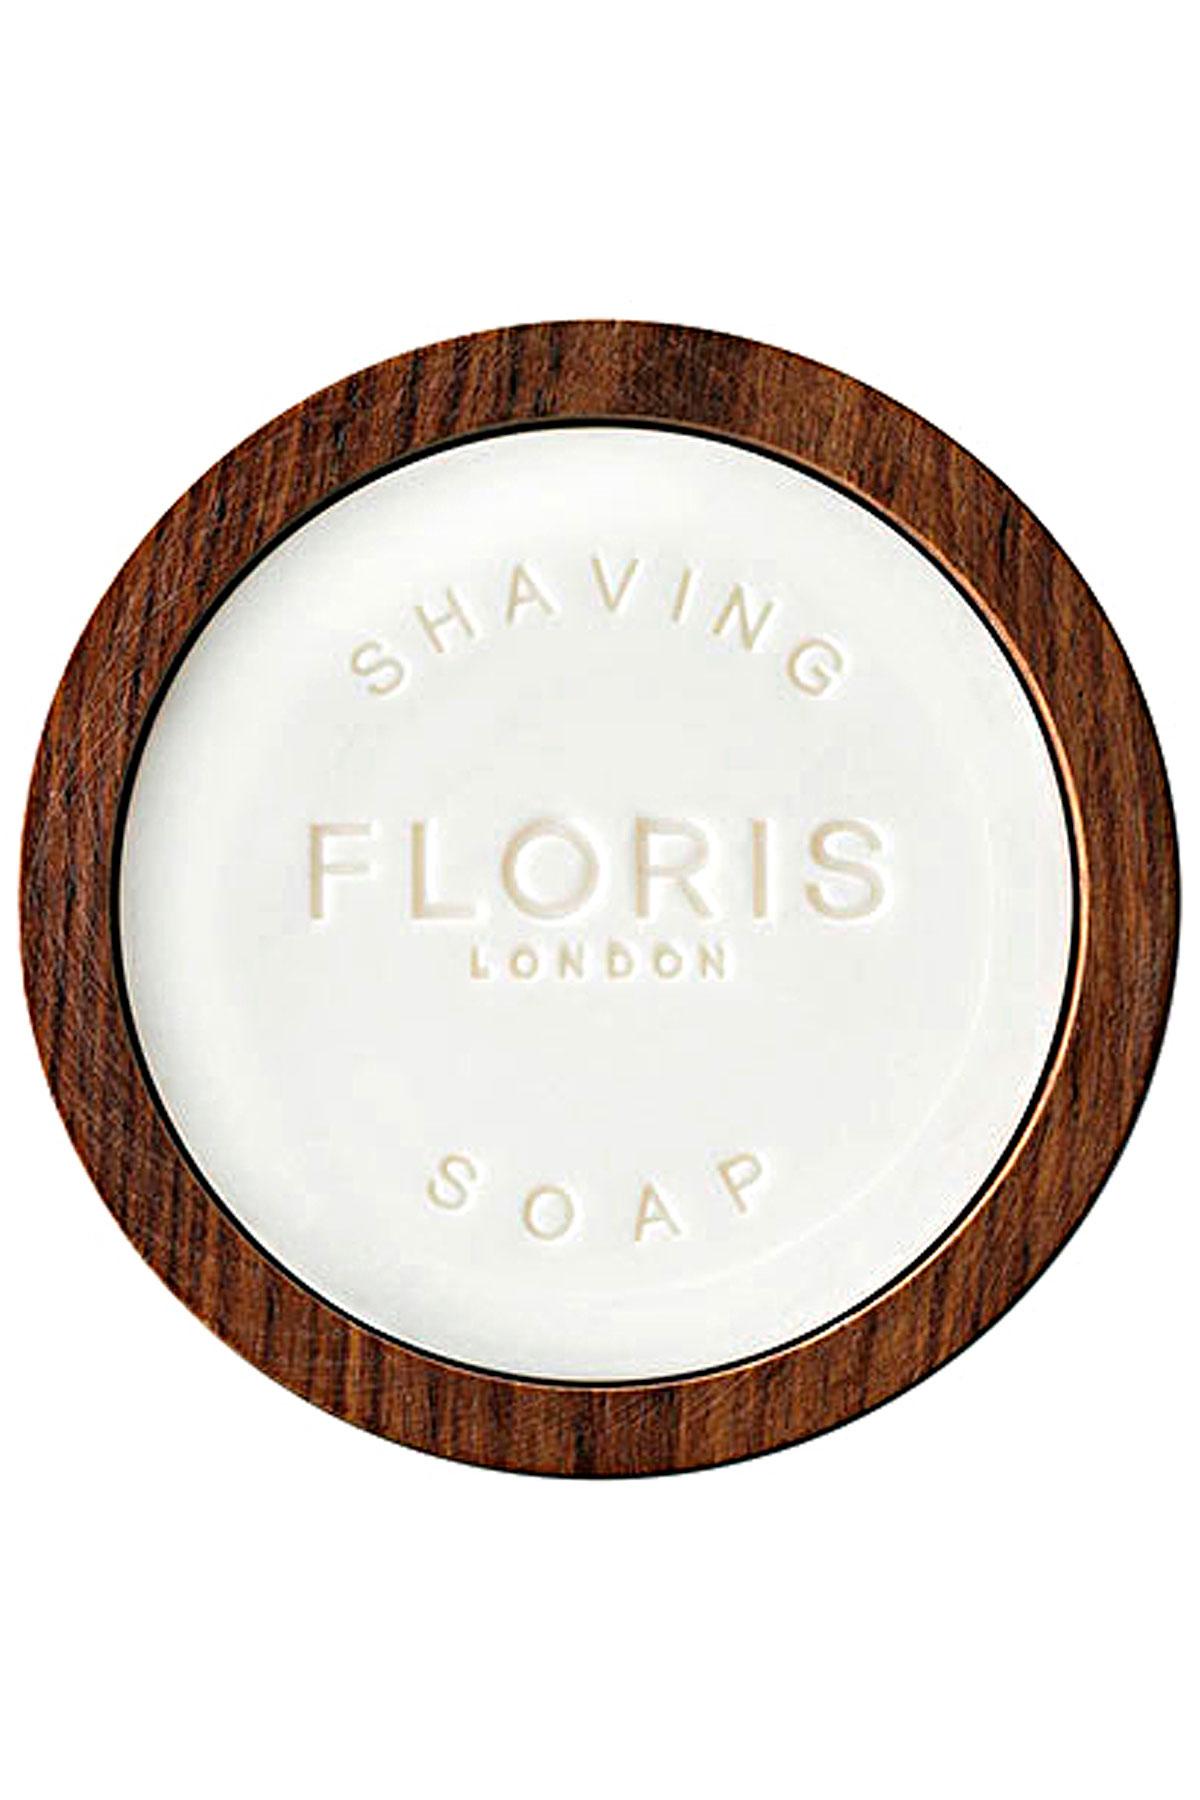 Floris London Shave for Men On Sale, Elite - Shaving Soap & Bowl - 100 Gr, 2019, 100 gr